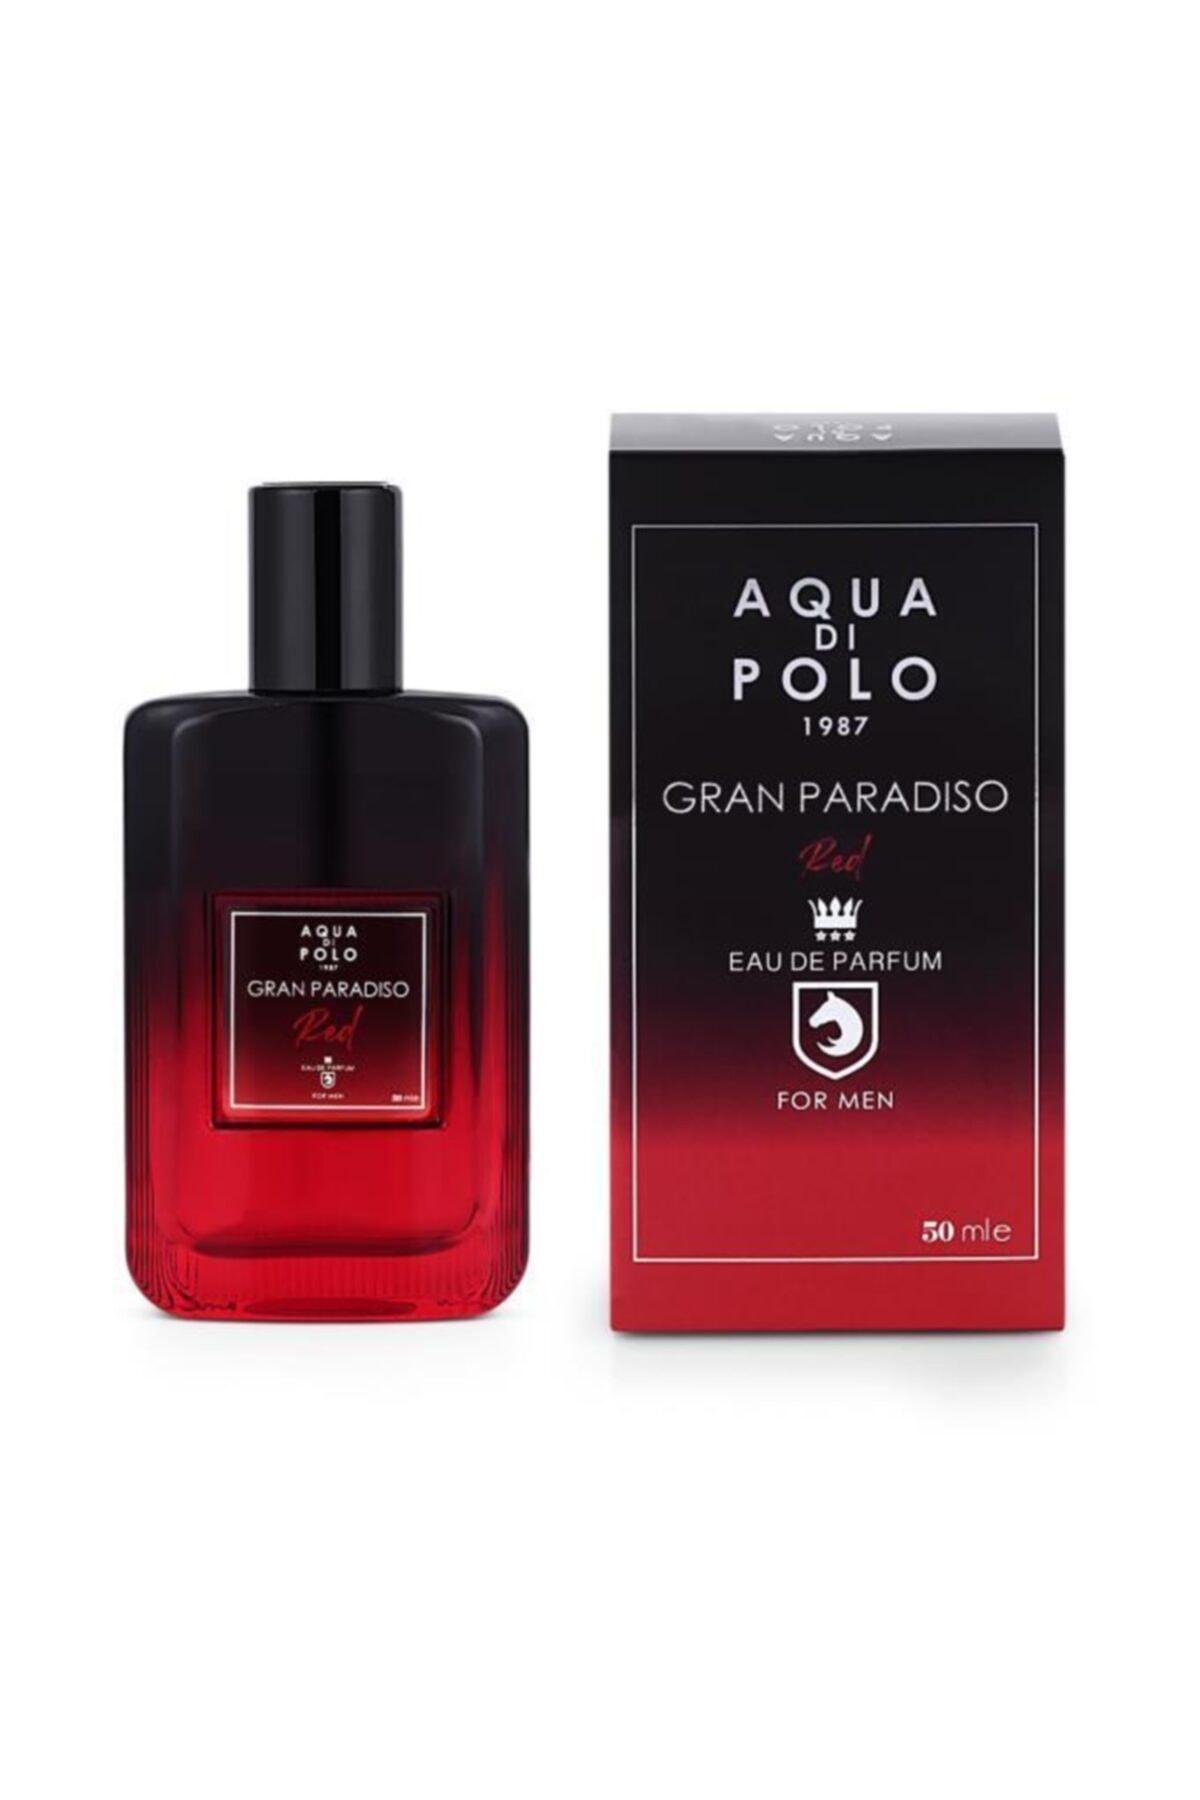 Aqua Di Polo 1987 Aynı Butikte 2. Ürün 1 TL Gran Paradiso Red Edp 50 ml Erkek Parfümü 8682367012760 1